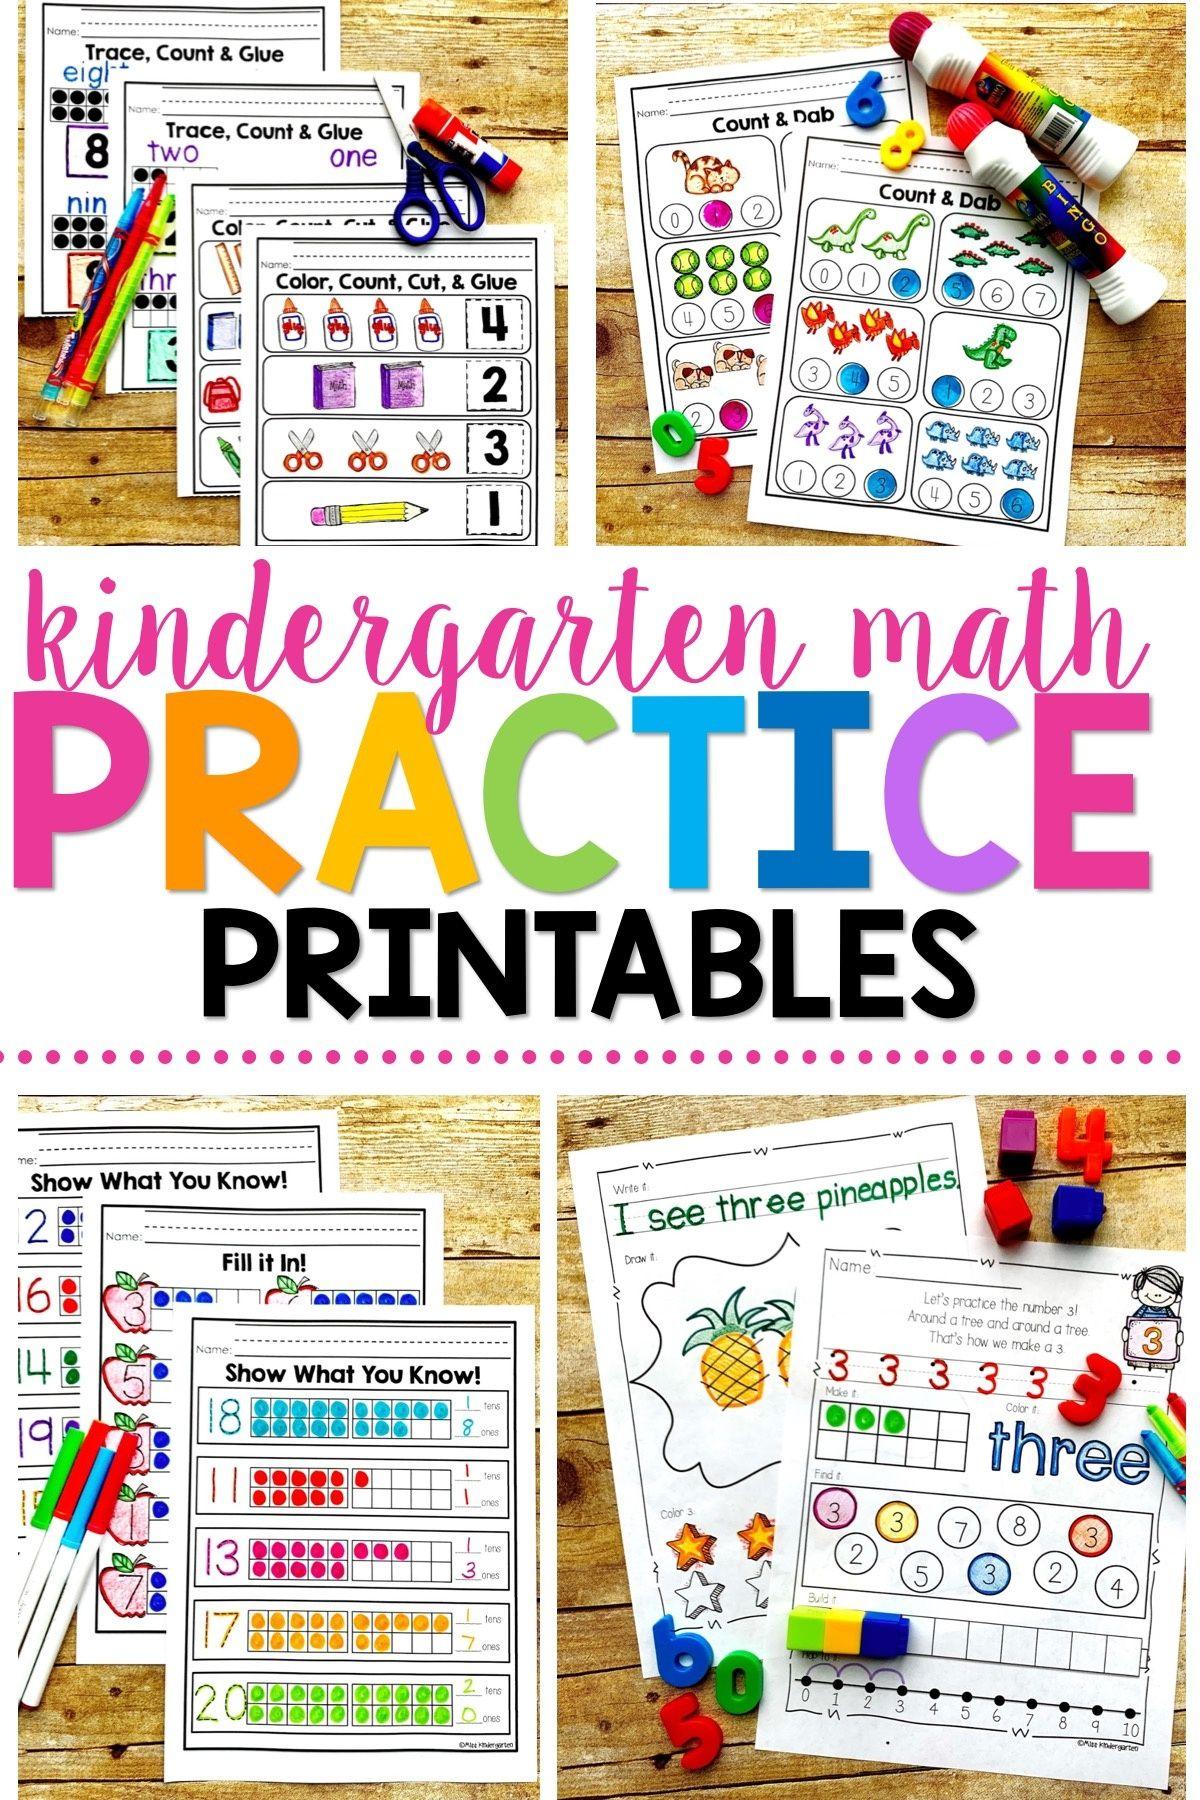 Number Sense Printables Bundle Pack Kindergarten Math Practice Miss Kindergarten Kindergarten Math Activities [ 1800 x 1200 Pixel ]